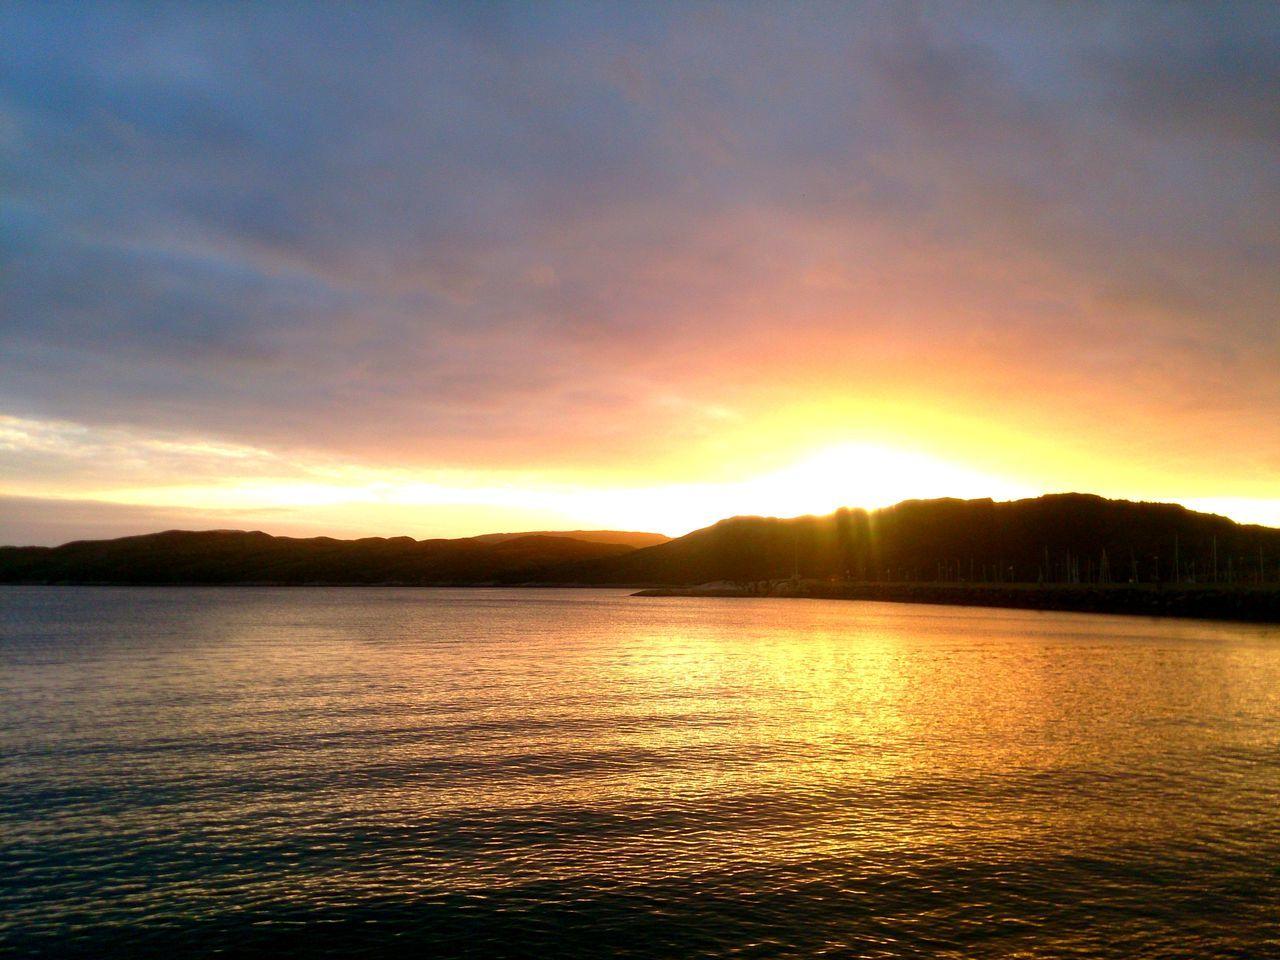 2016 Bodø Dramatic Sky Midnattsol Midtsommer Mitternachtssonne Mittsommer Moloveien Nordland Nordnorge Nordnorwegen Norge Norway Norwegen SanktHans Sun Sunset Water